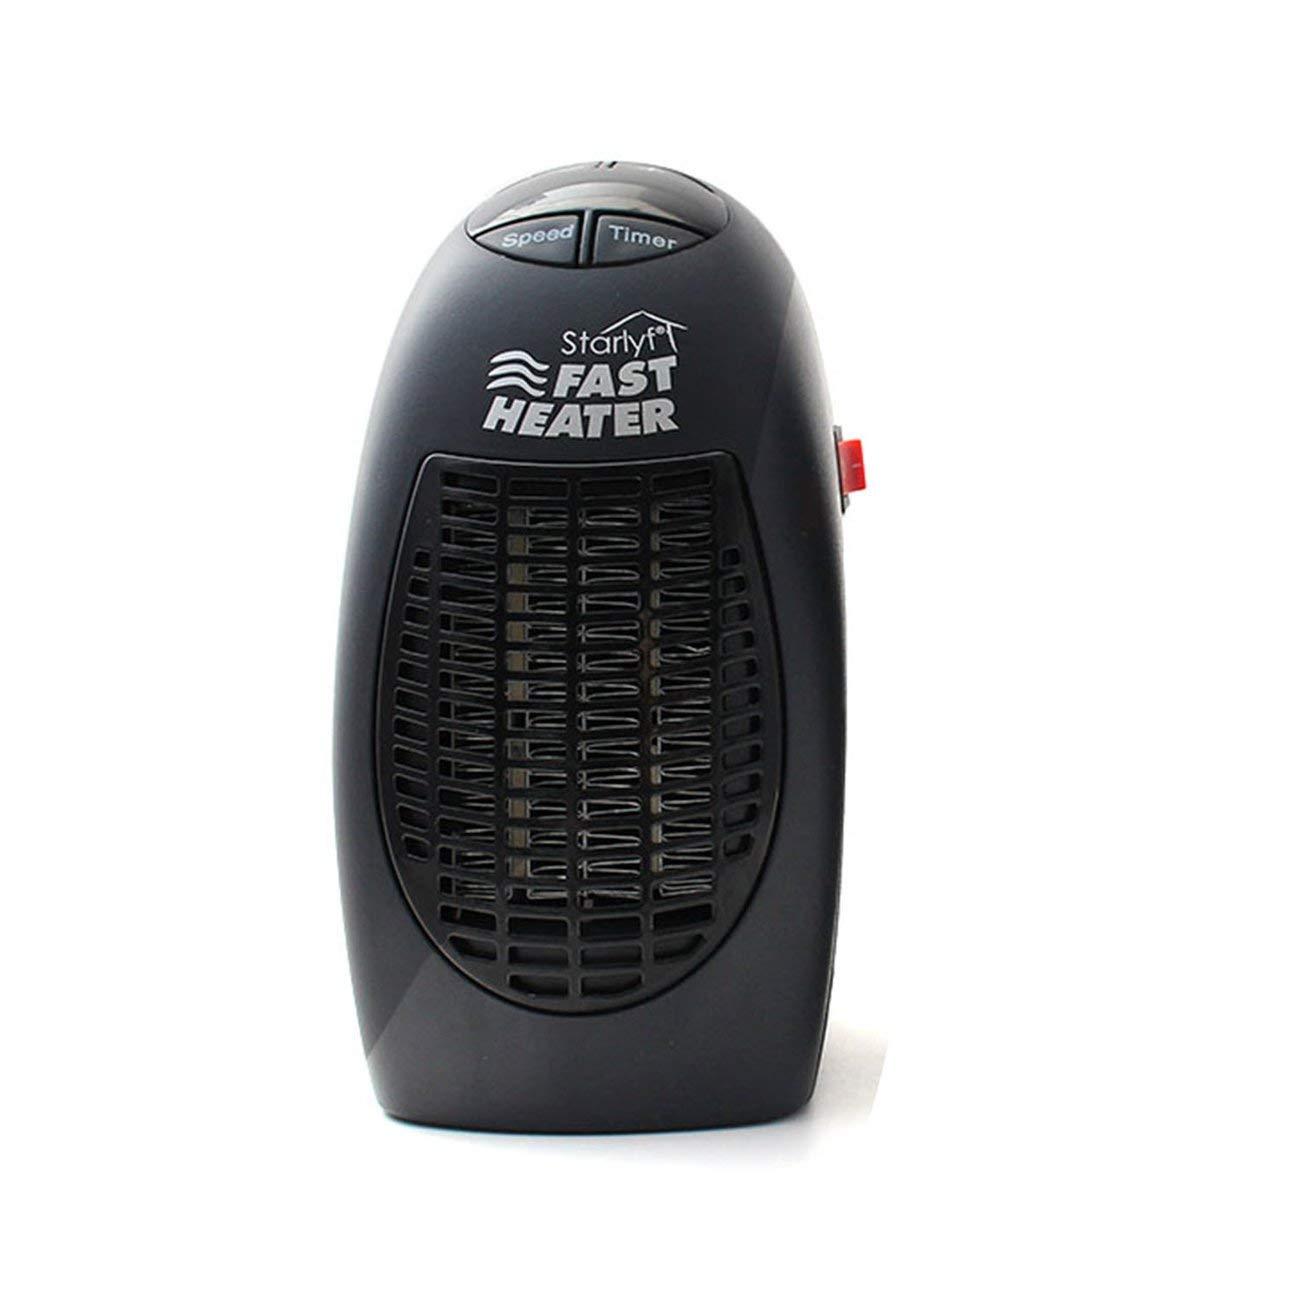 Azalea Salida de Pared, Mini, portá til, Calentador de calefacció n, Aire Acondicionado, para el hogar, Ventilador elé ctrico, radiador, Estufa de Ventilador, Calentador, UE portátil Calentador de calefacción Ventilador eléctrico